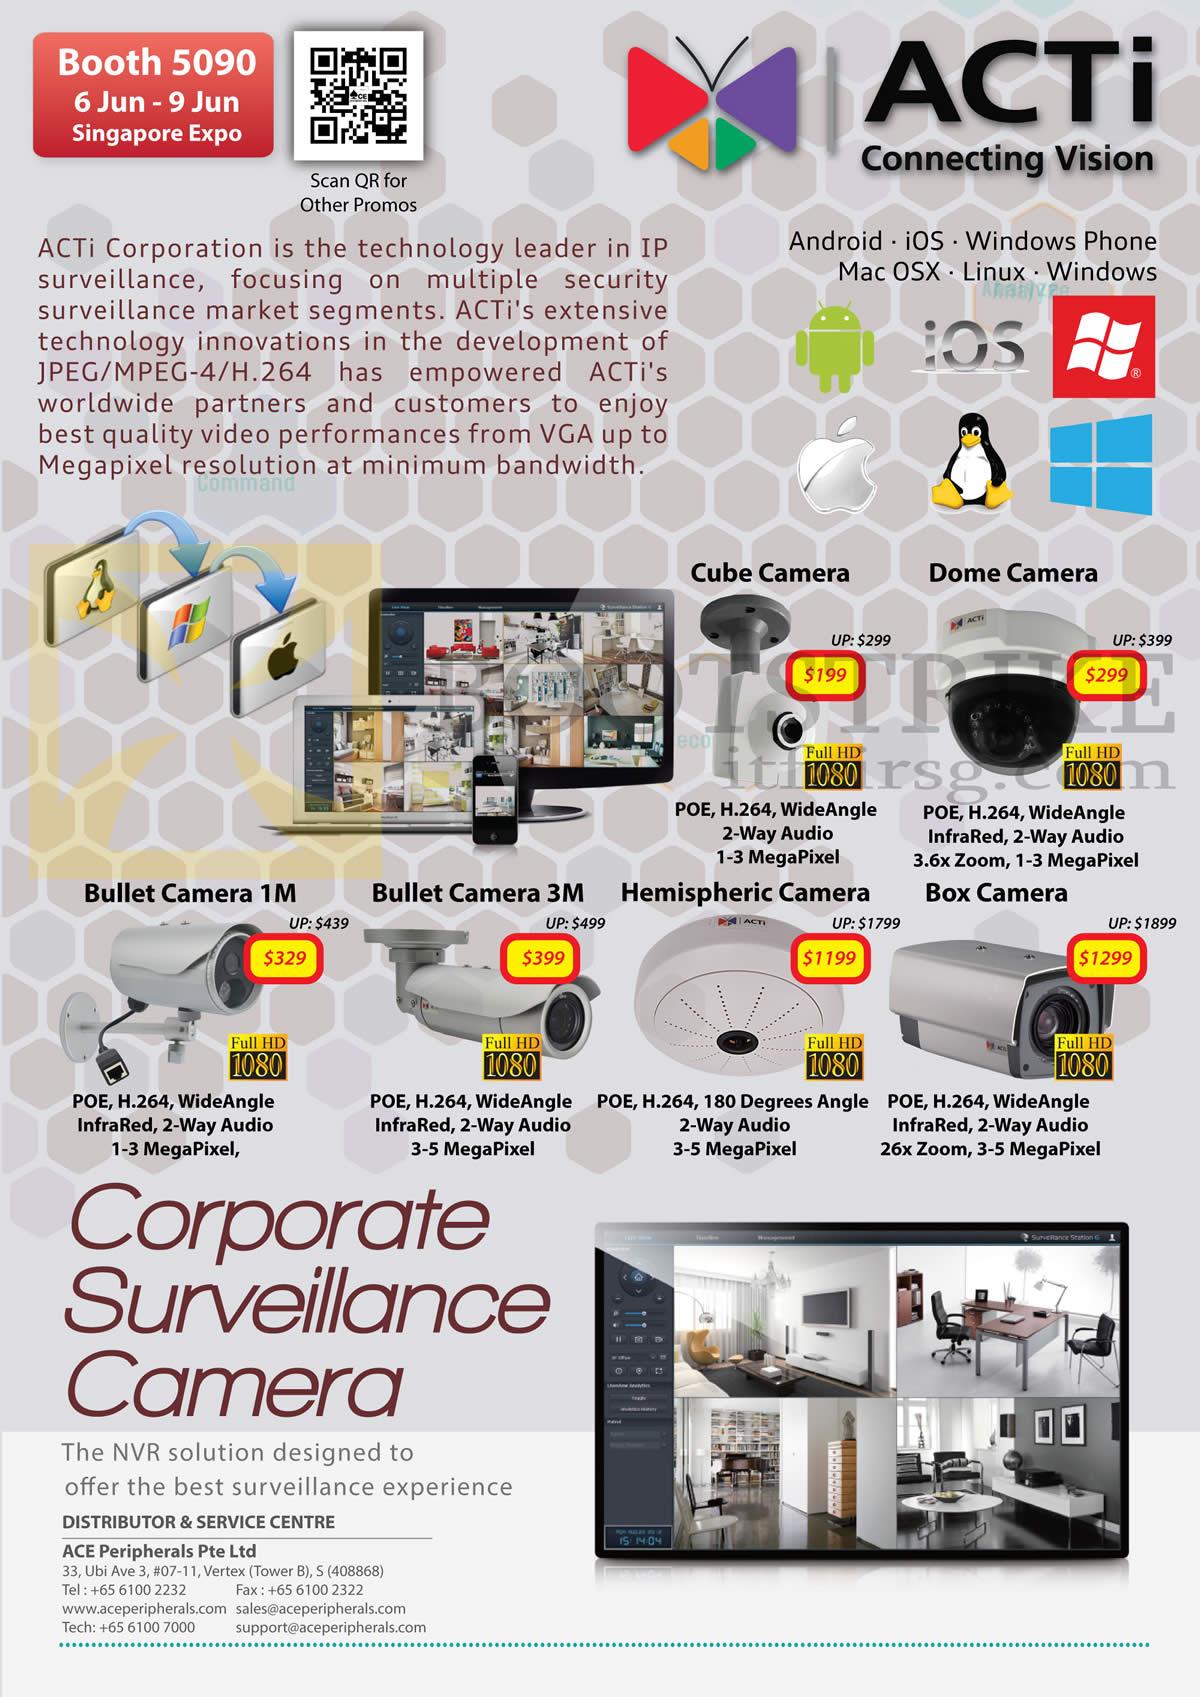 PC SHOW 2013 price list image brochure of Ace Peripherals IPCam Surveillance ACTi Cube Dome Bullet Hemispheric Box SpeedDome